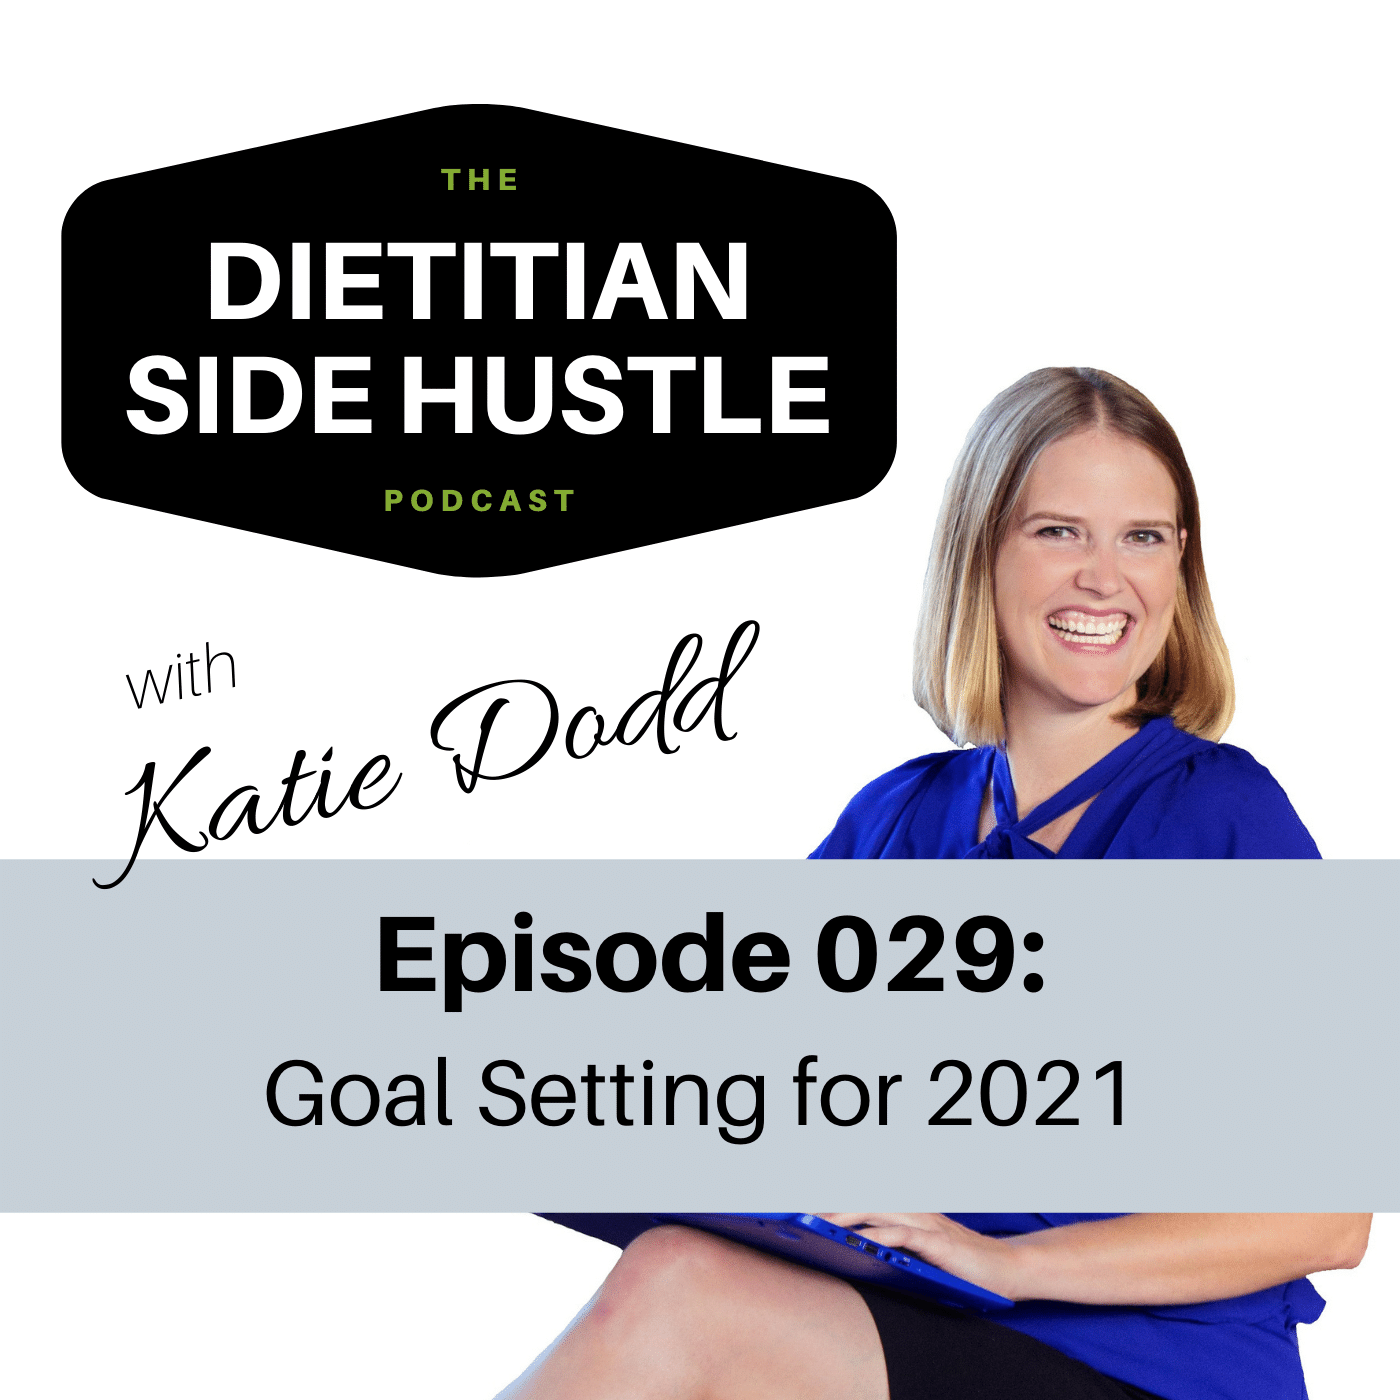 Episode 029: Goal Setting for 2021